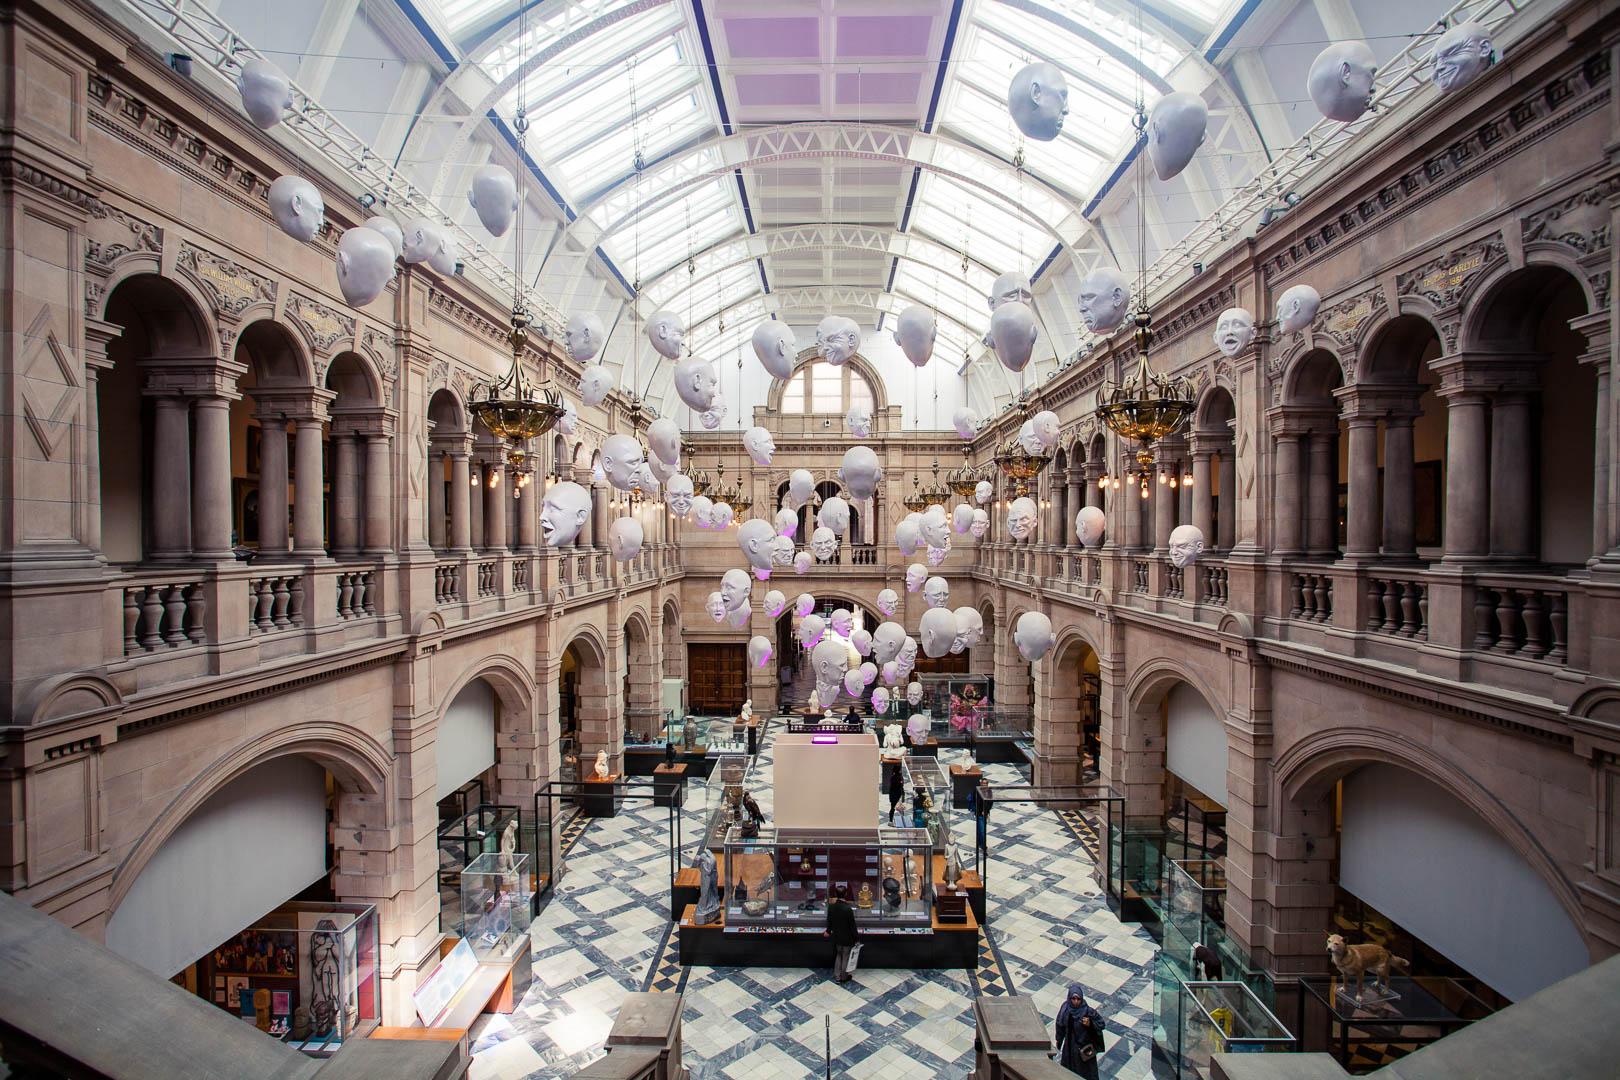 Kelvingrove Museum & Art Gallery